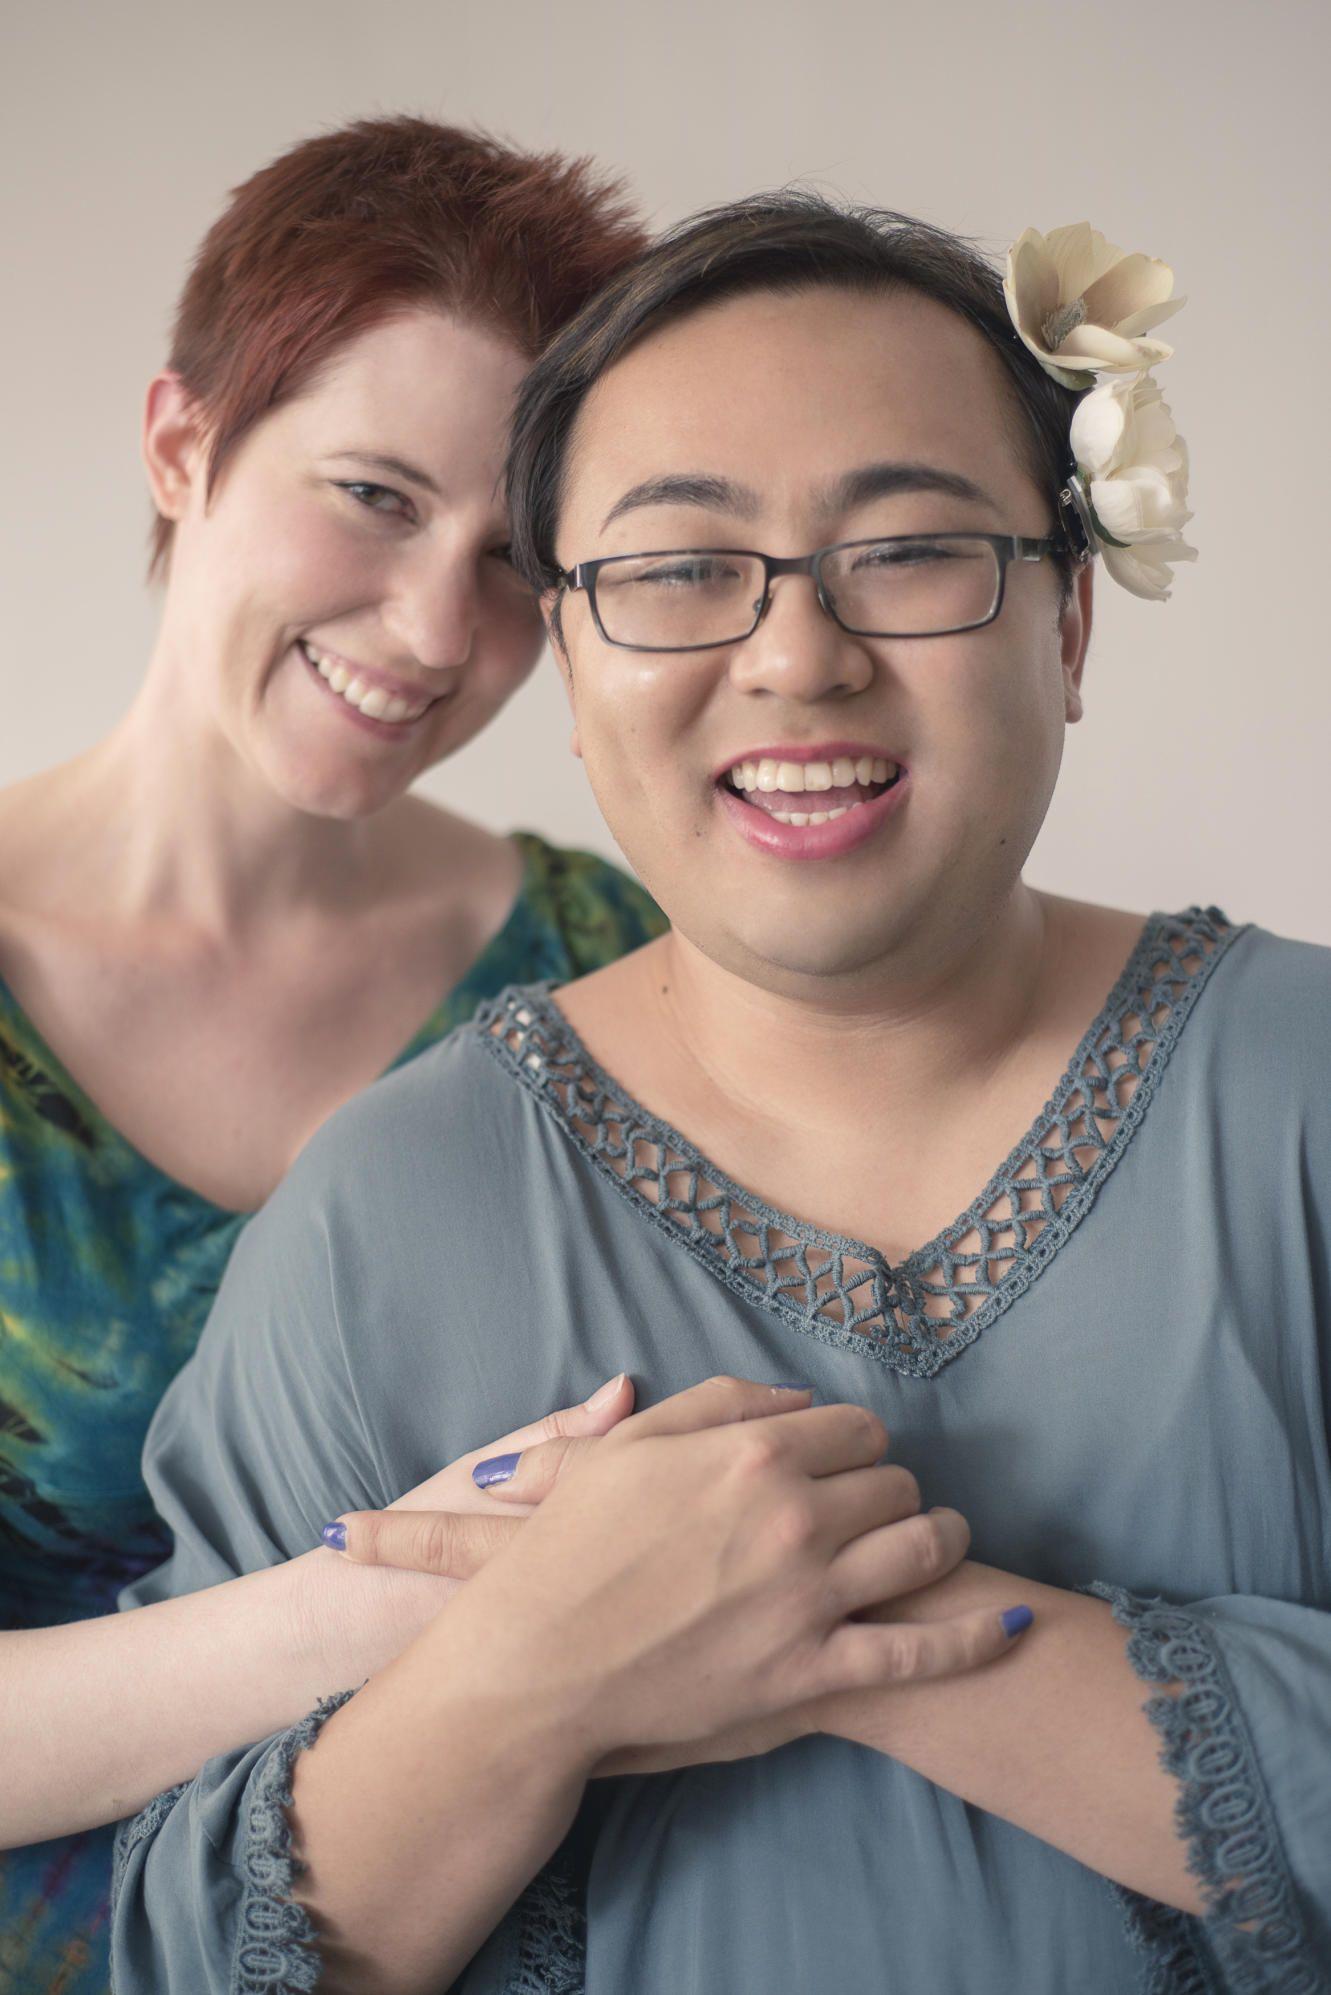 My boyfriend came out transgender